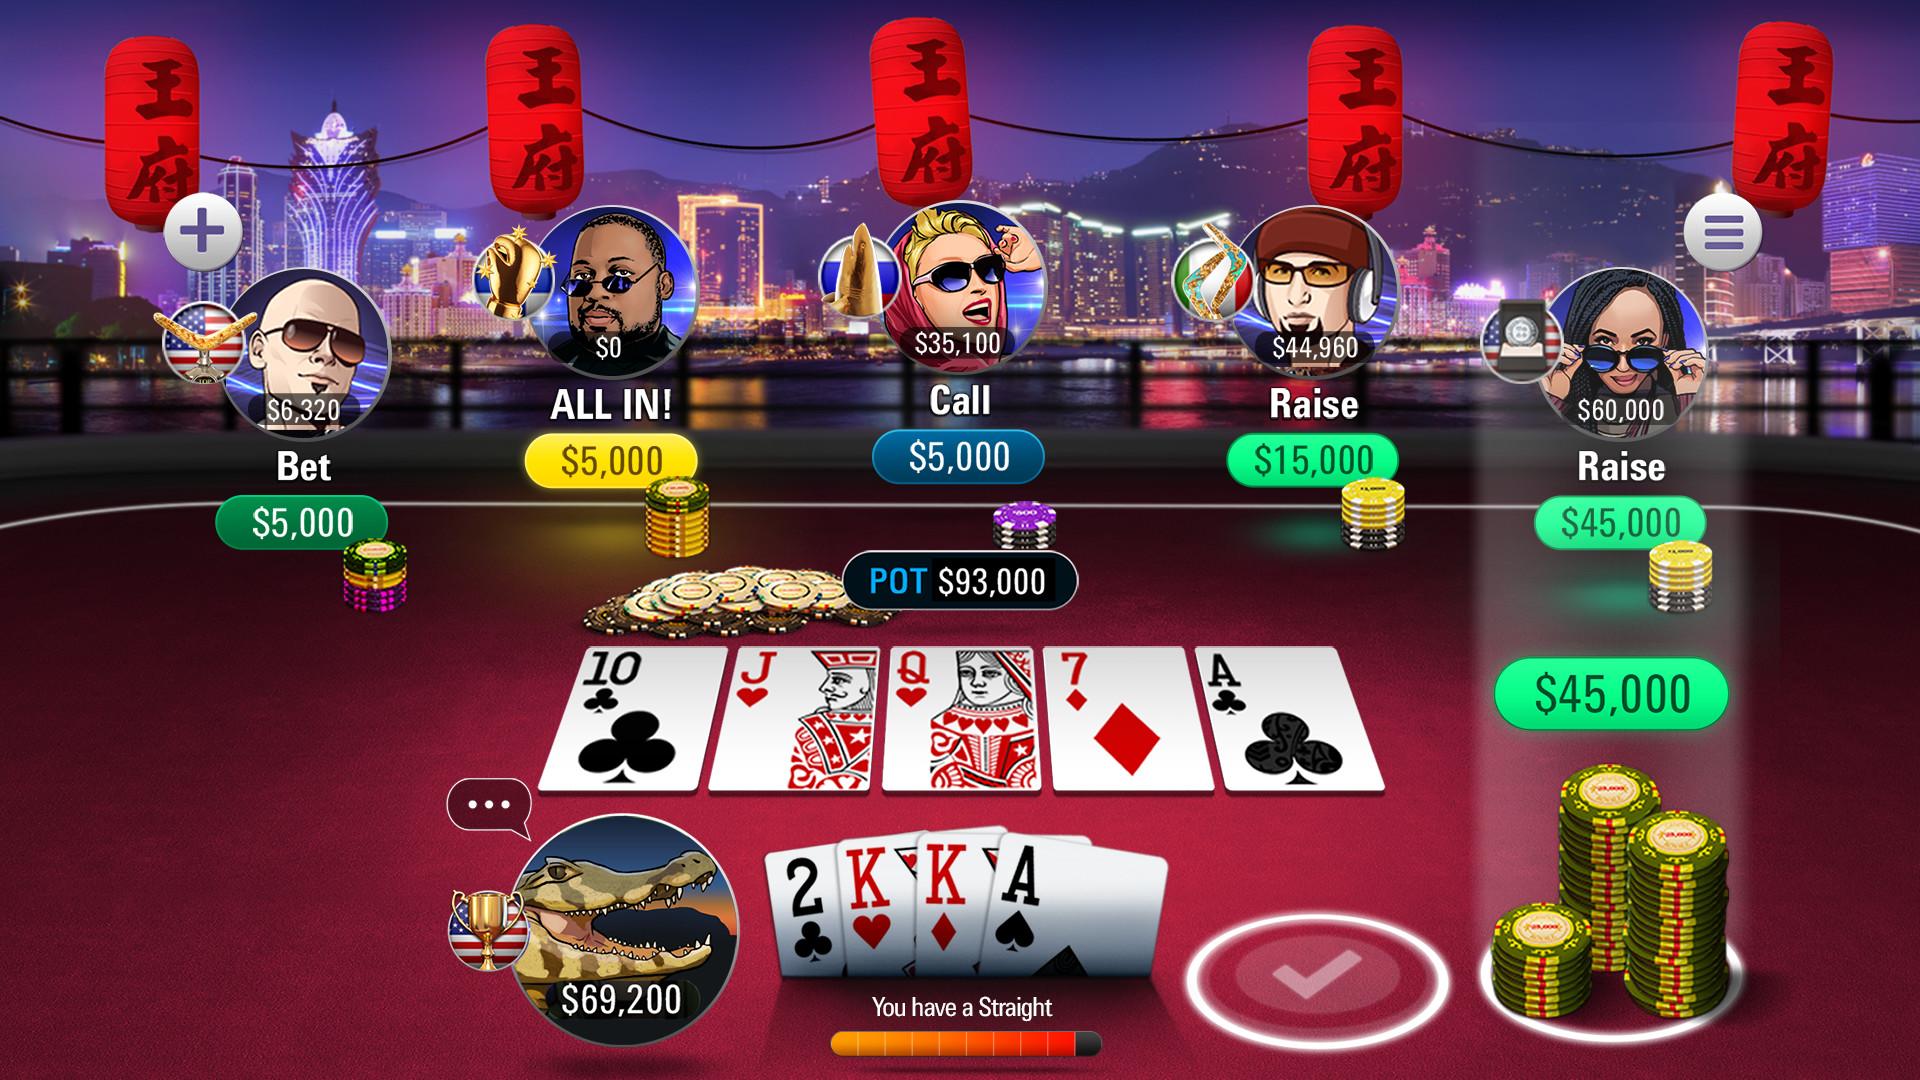 Poker jackpot does the ipad air 2 have a sim card slot